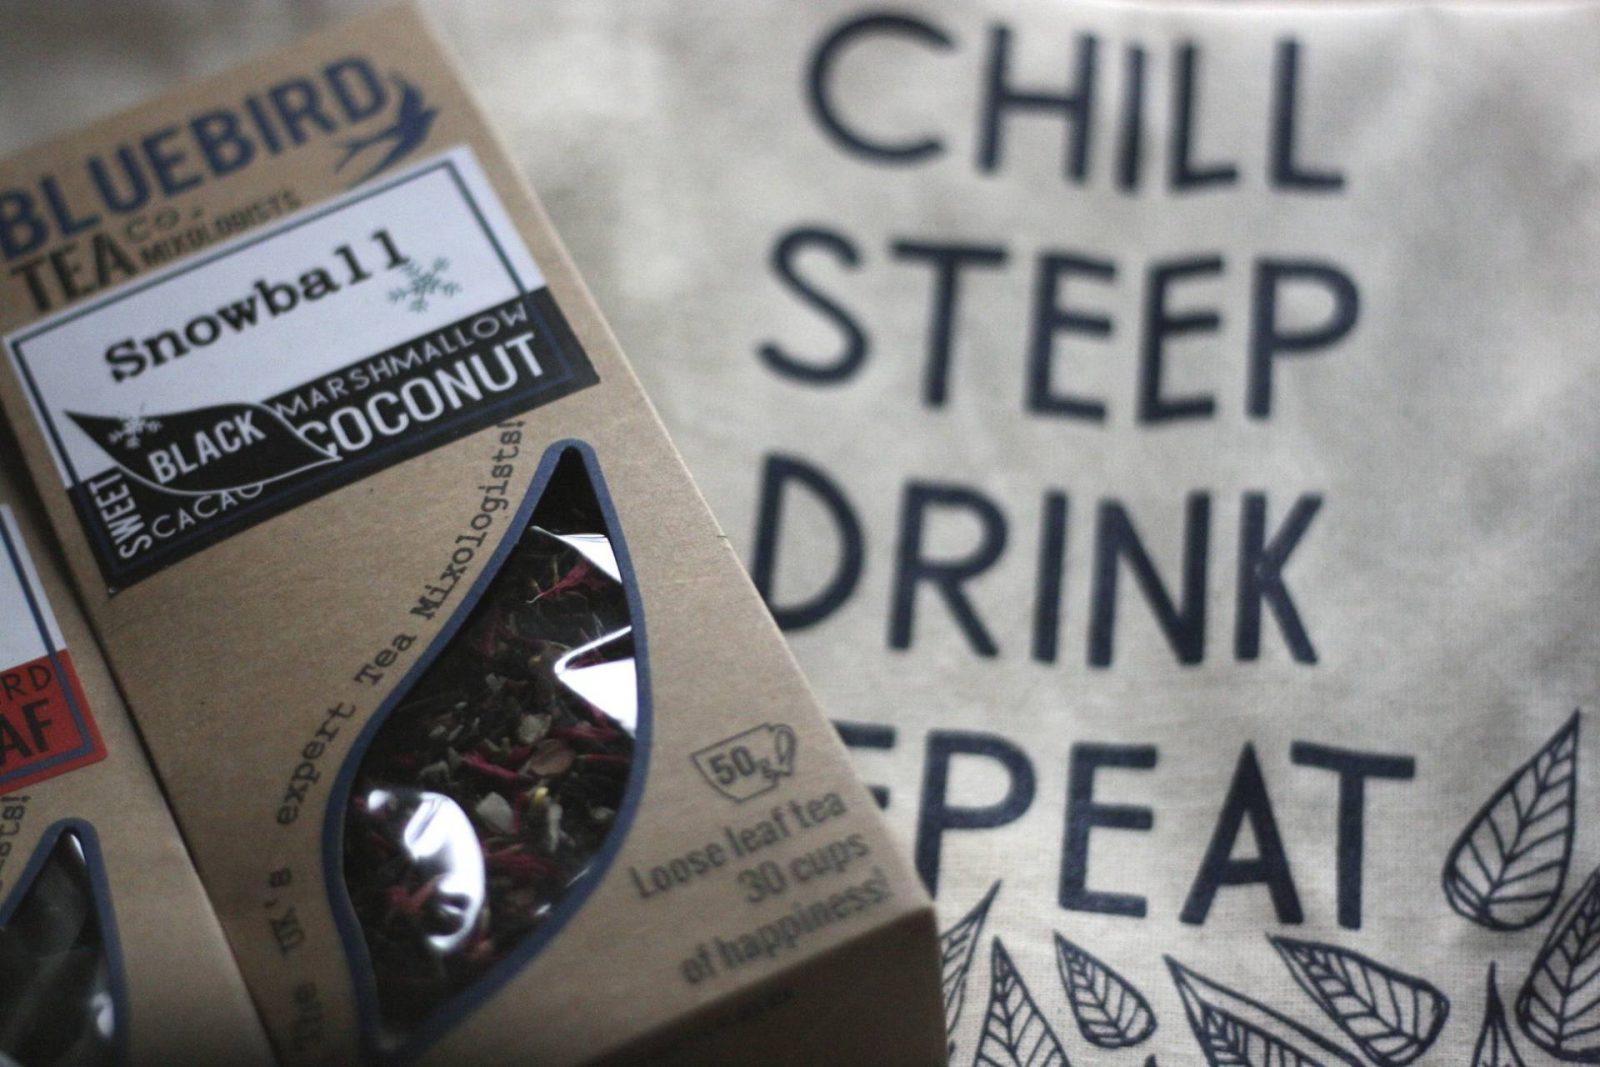 christmas 2015: festive brews from bluebird tea company;